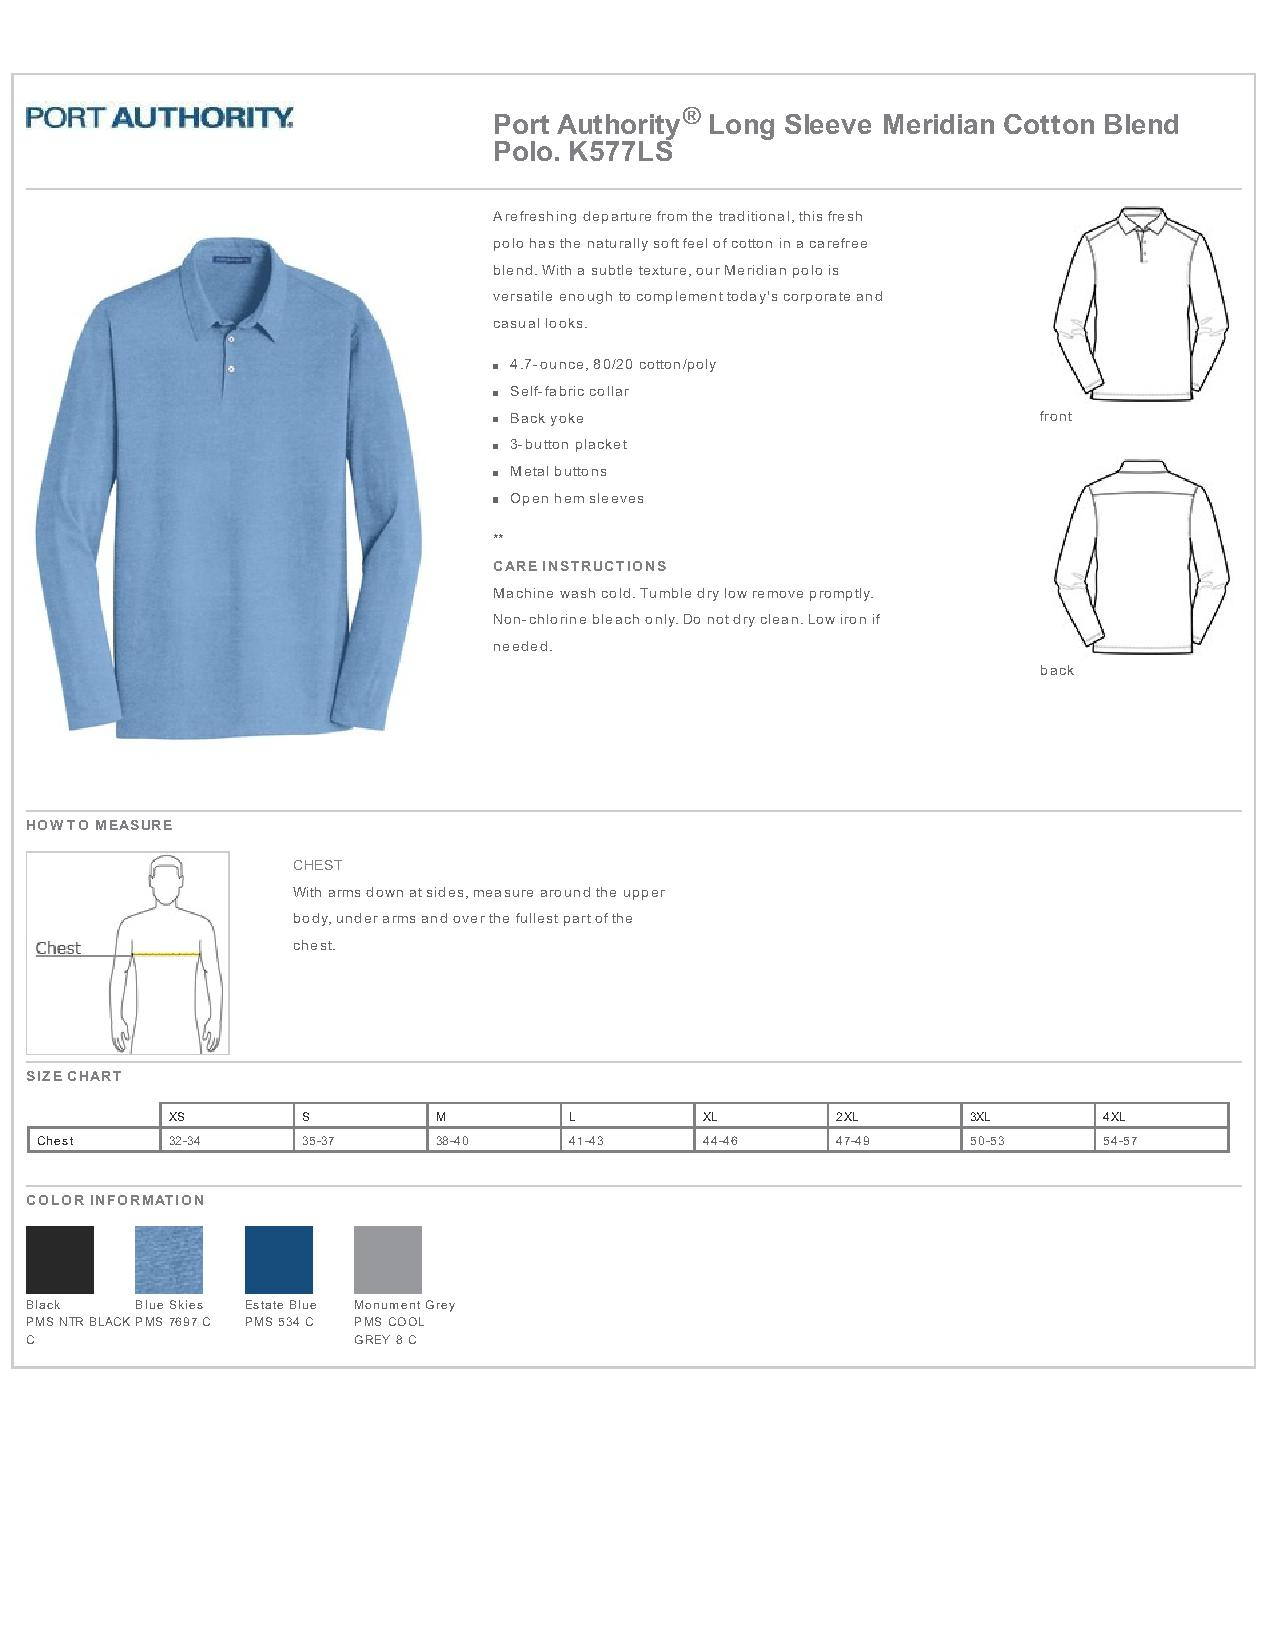 Details about  /K577LS Port Authority Long Sleeve Meridian Cotton Blend Polo